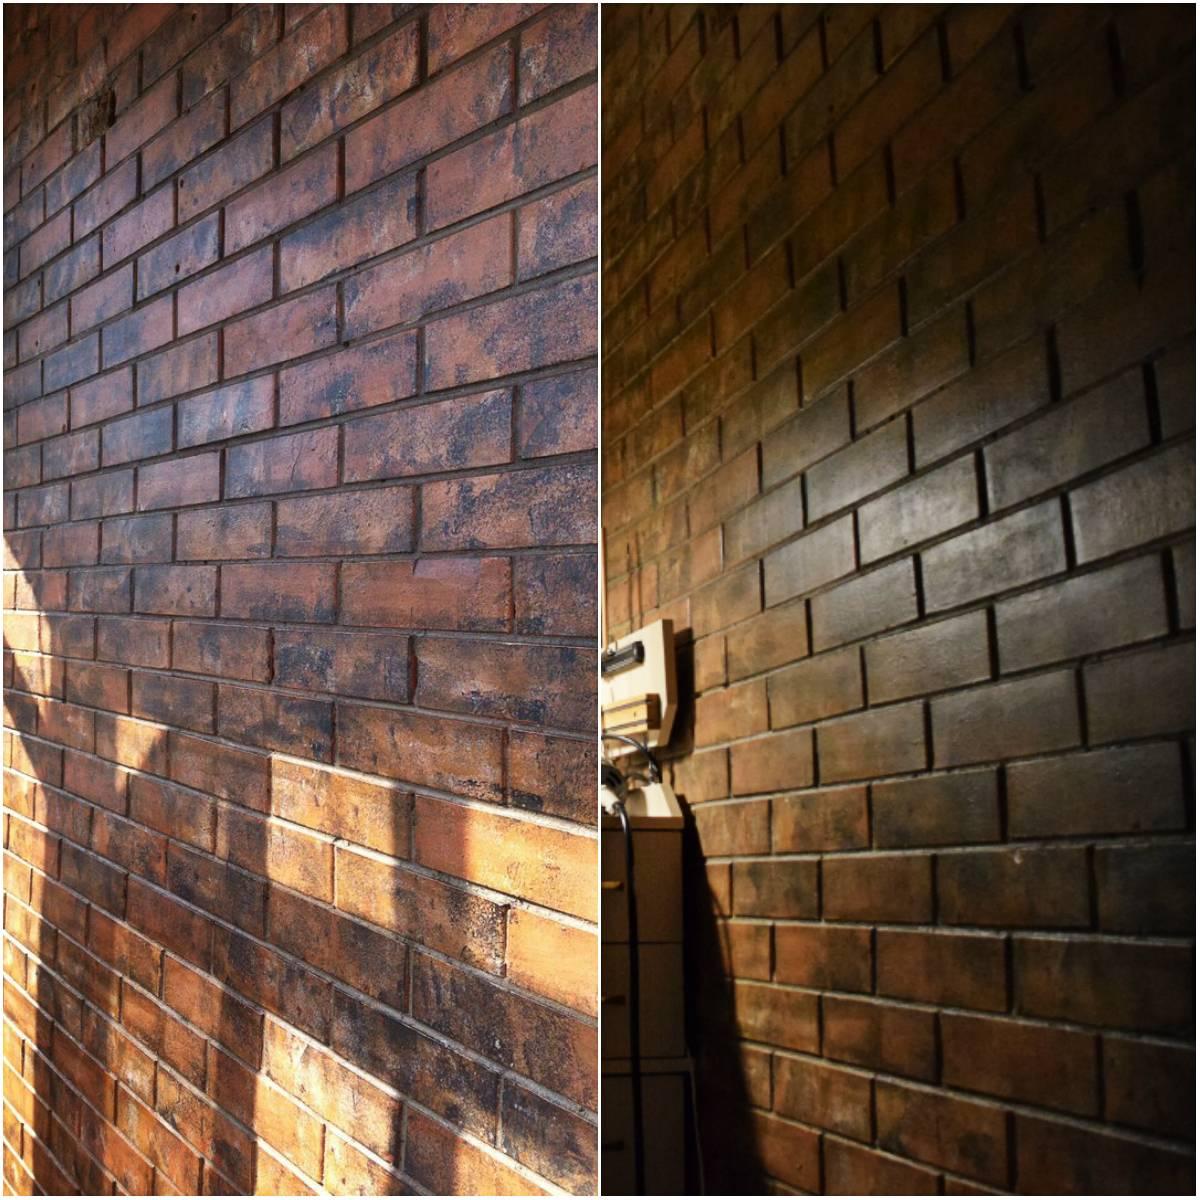 покраска кирпичных стен внутри фото доступно для